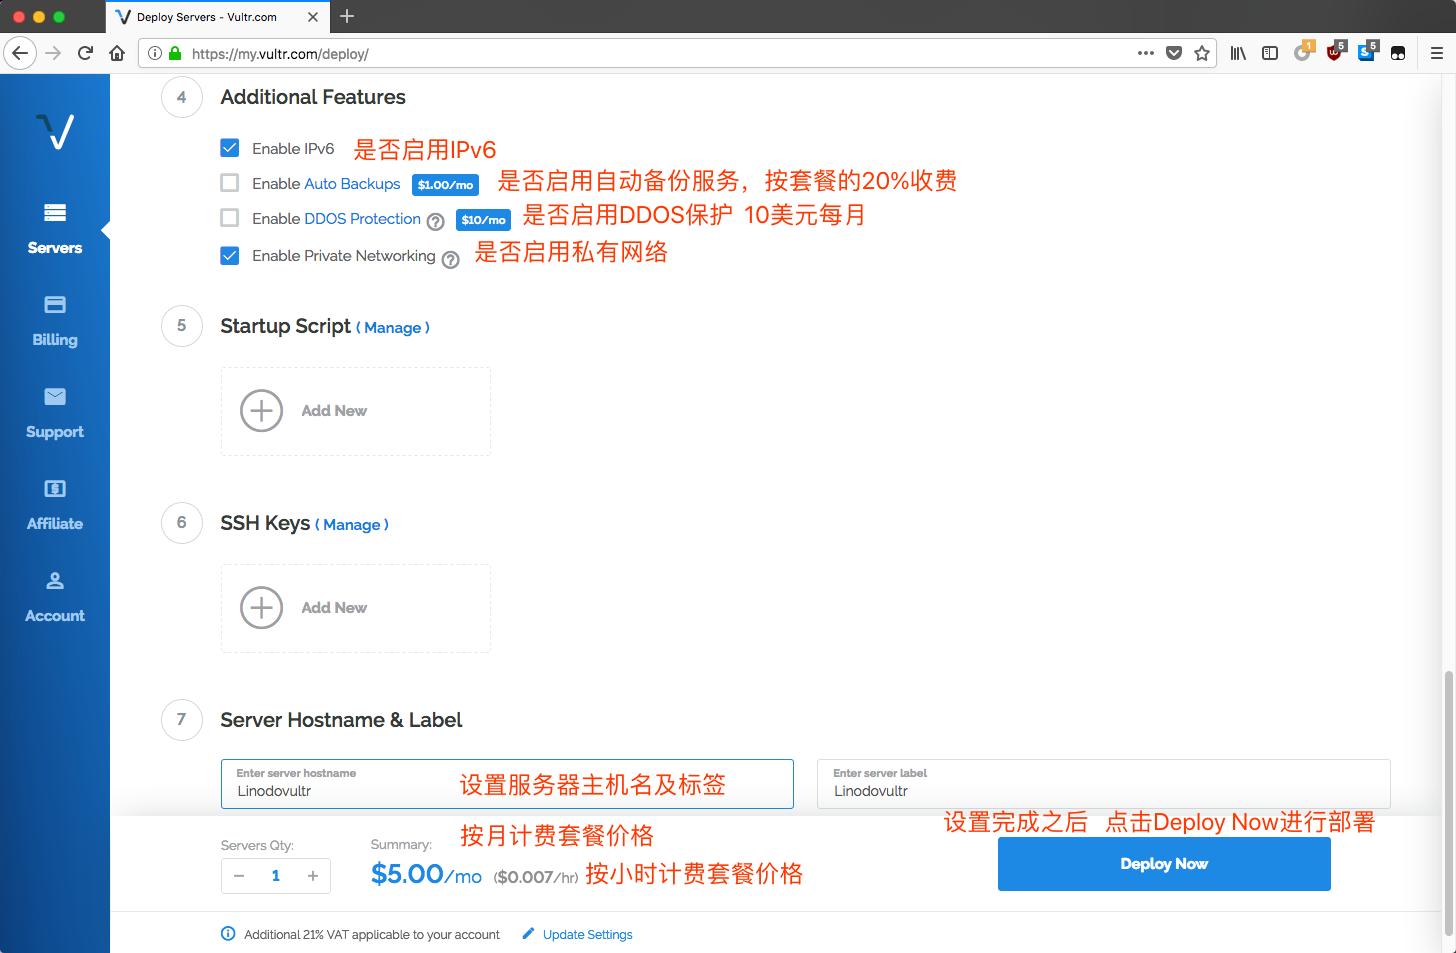 vultr-deploy-new-server-enable-services-setting-hostname-label